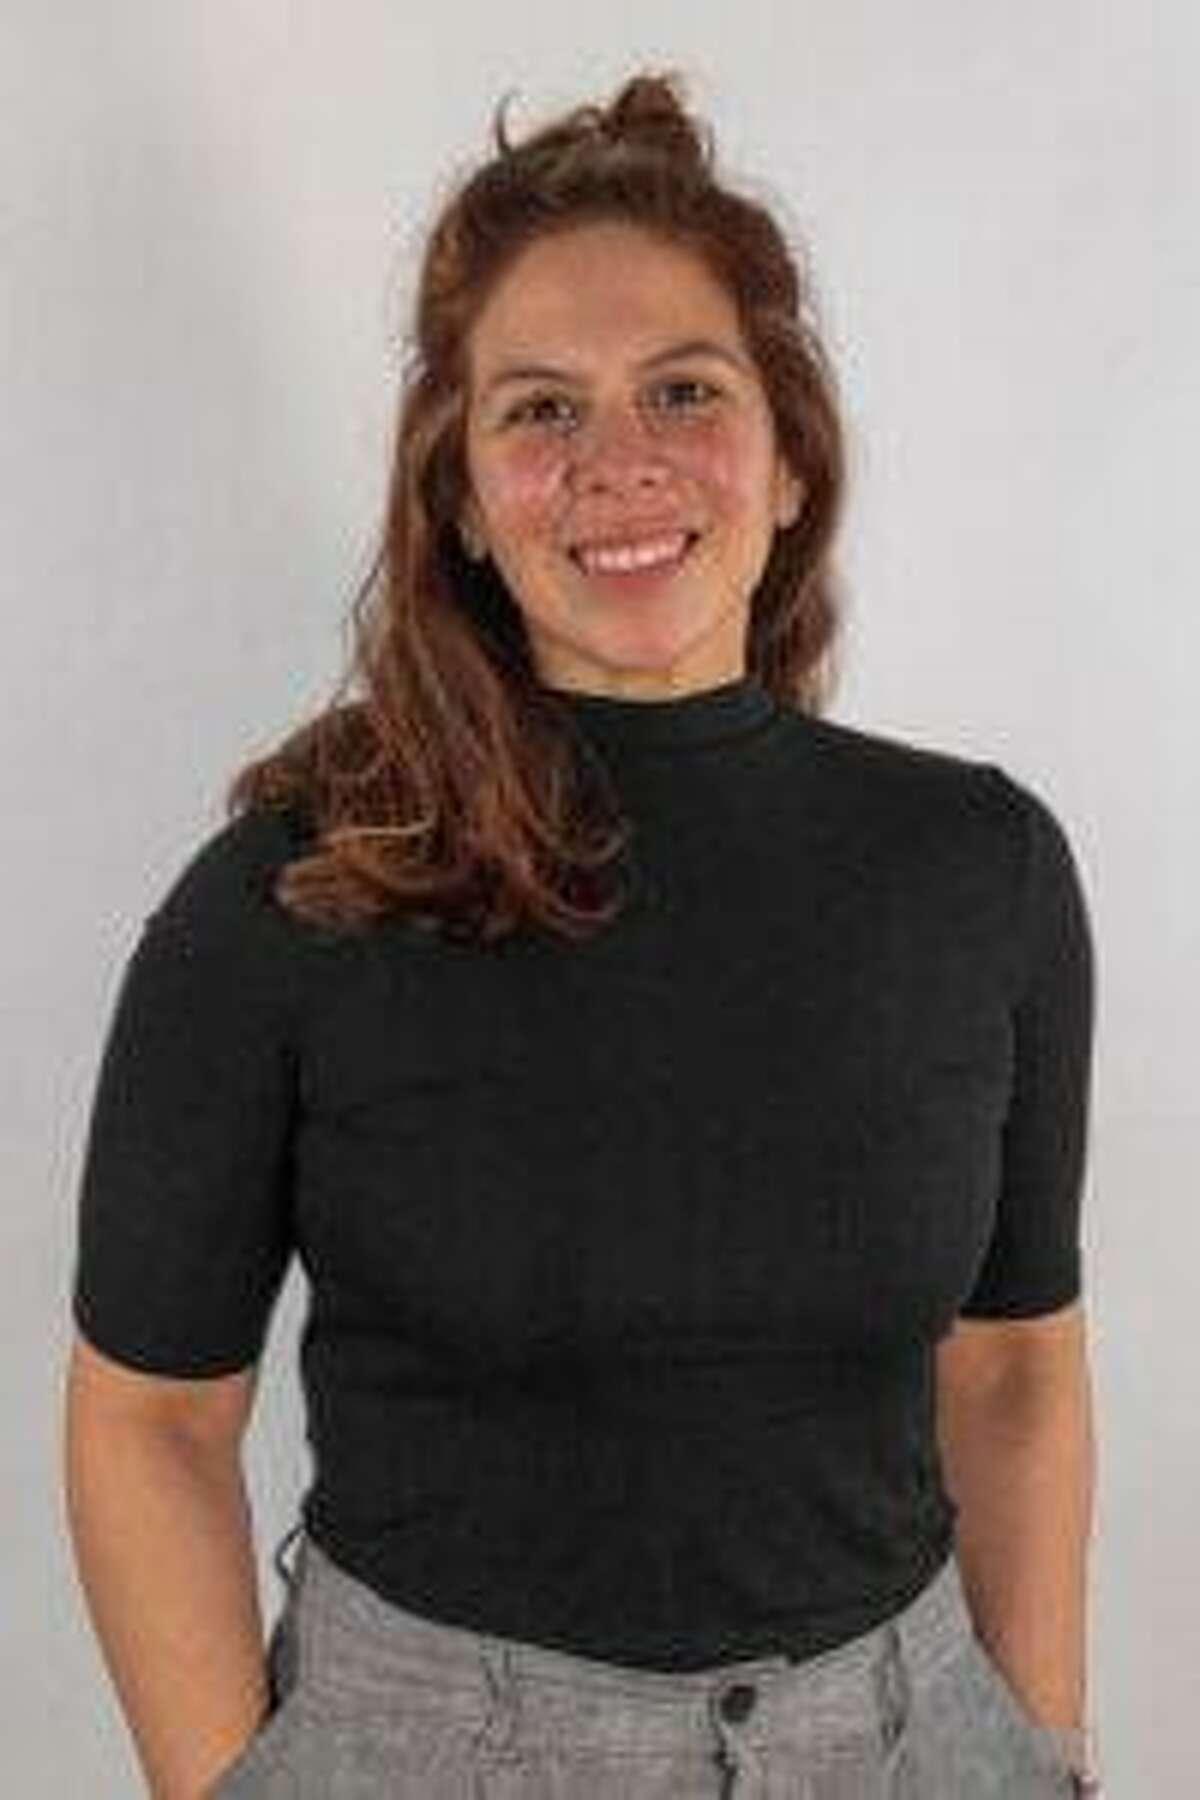 Antoinette Hernandez